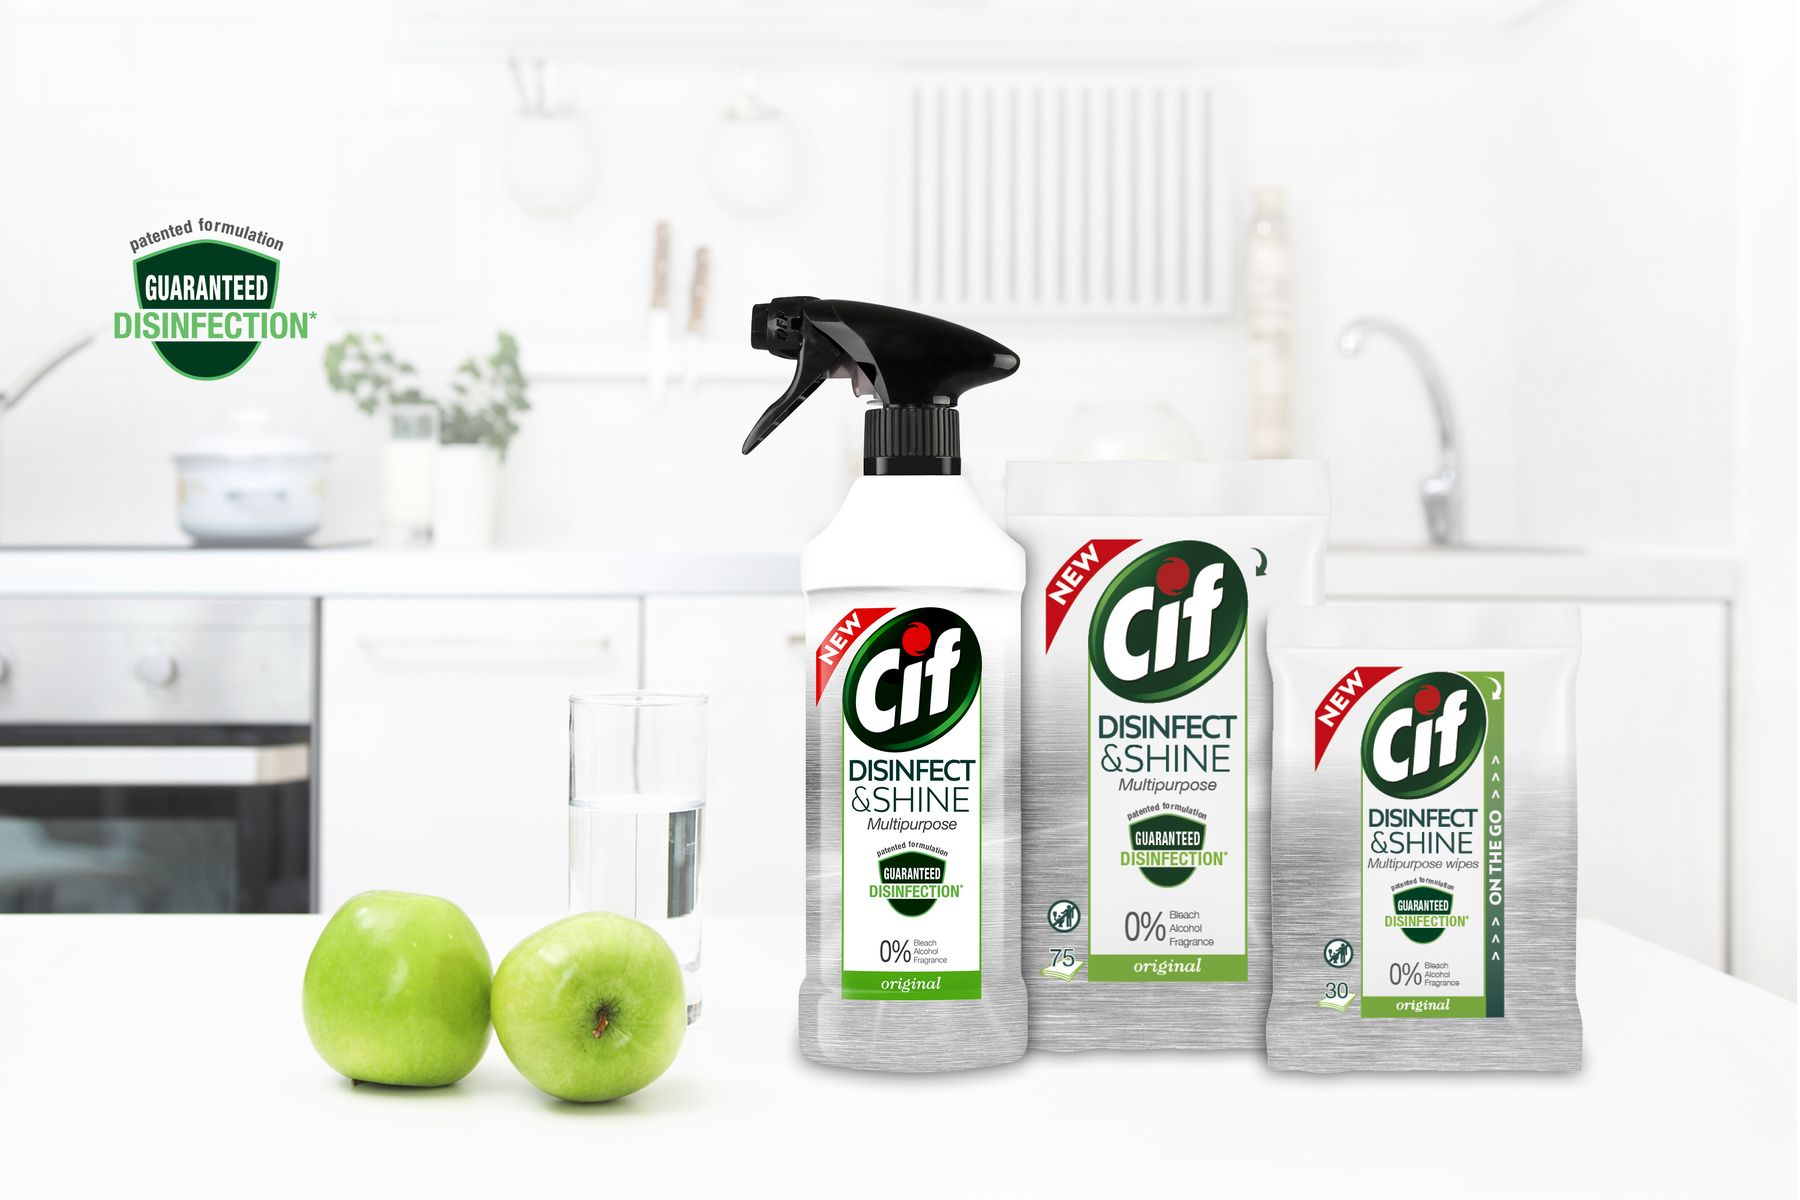 CIF Disinfect & Shine Sfeerbeeld Banner